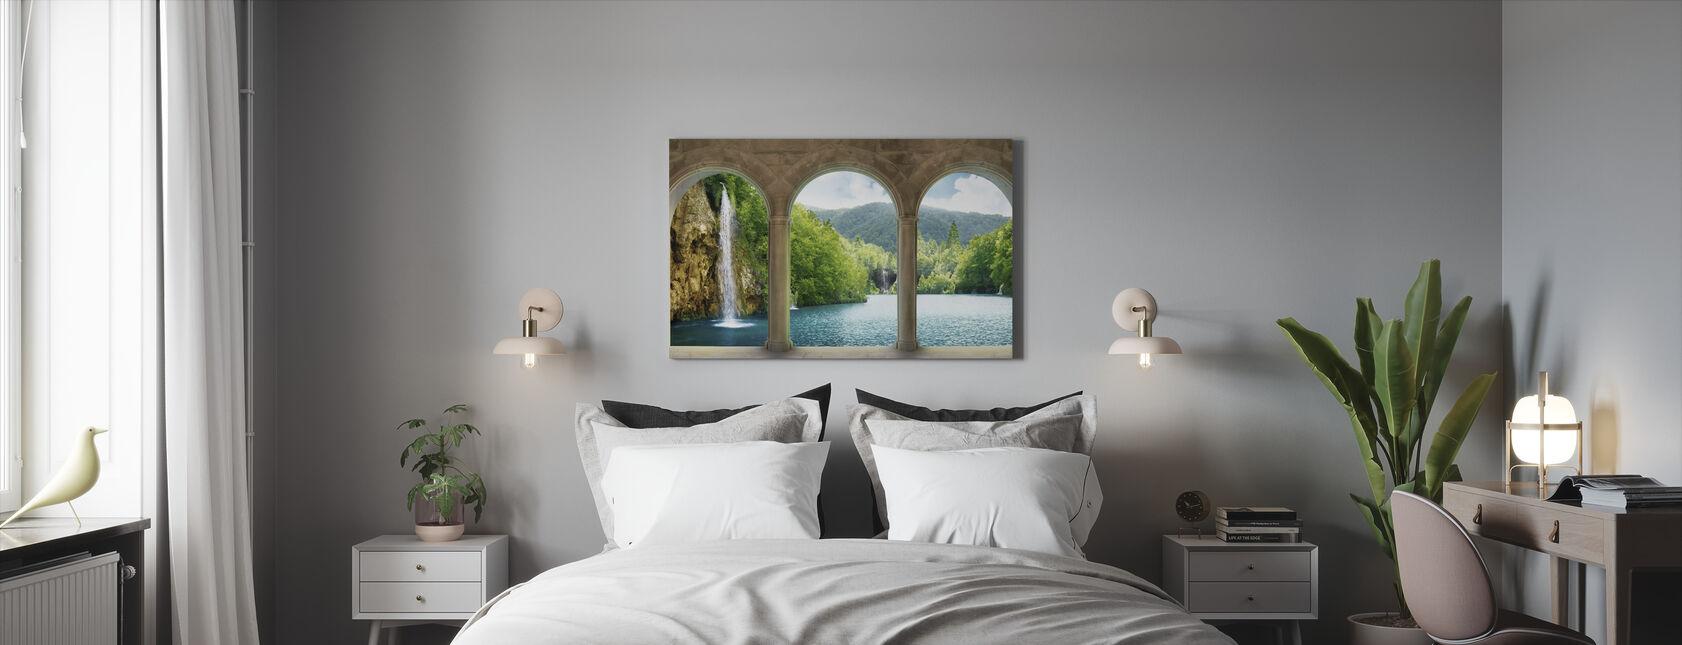 Waterval achter Vault - Canvas print - Slaapkamer